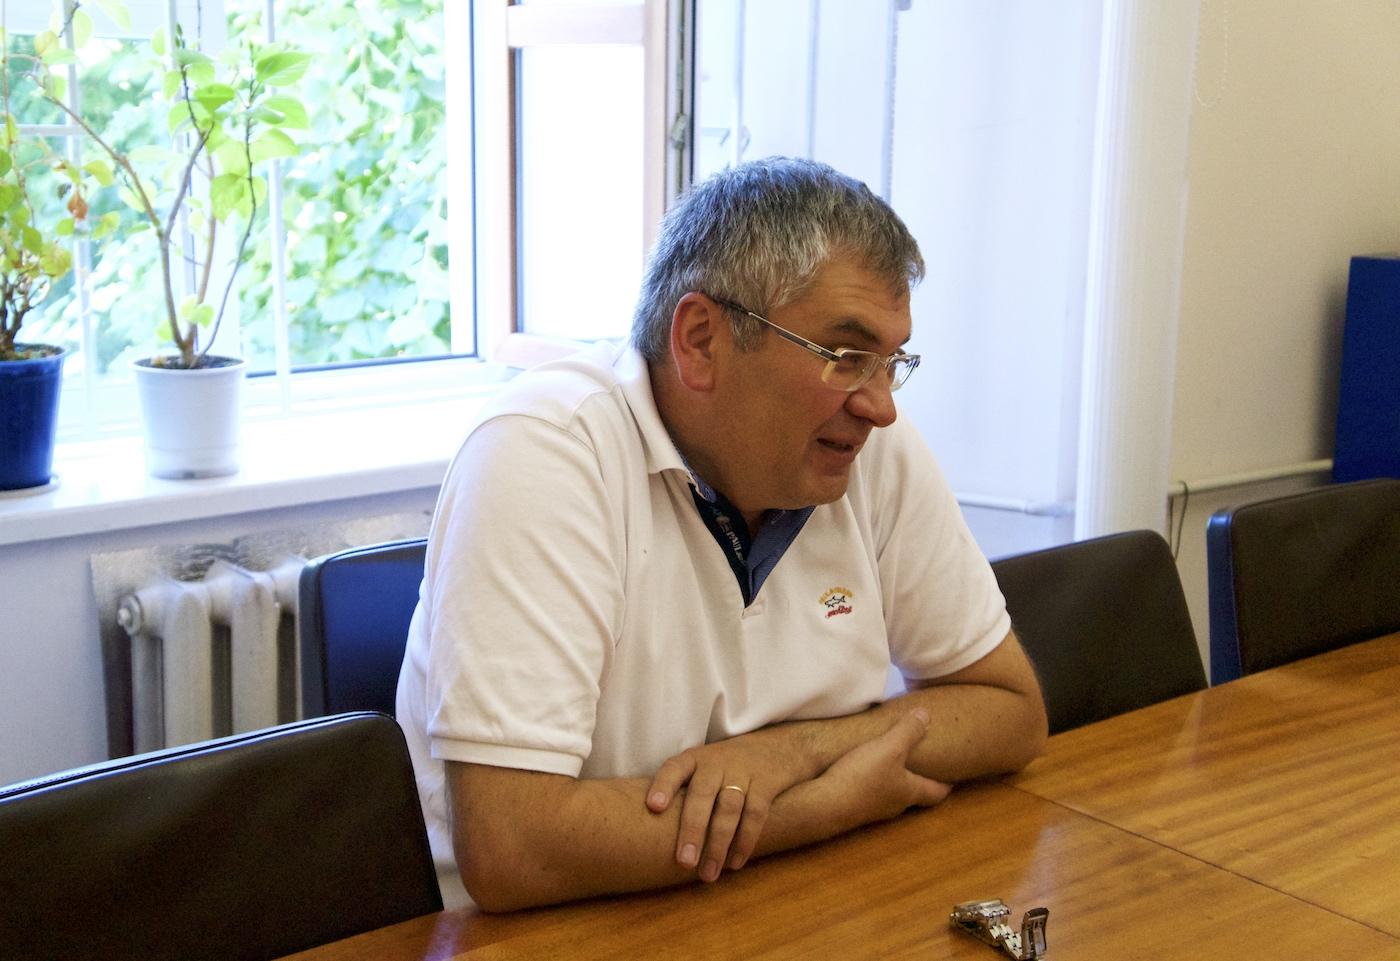 Jurij Legun: «Spočatku ne groši, a ideja maje buty. Adže arhivy zberigajuť našu kolektyvnu pam'jať»